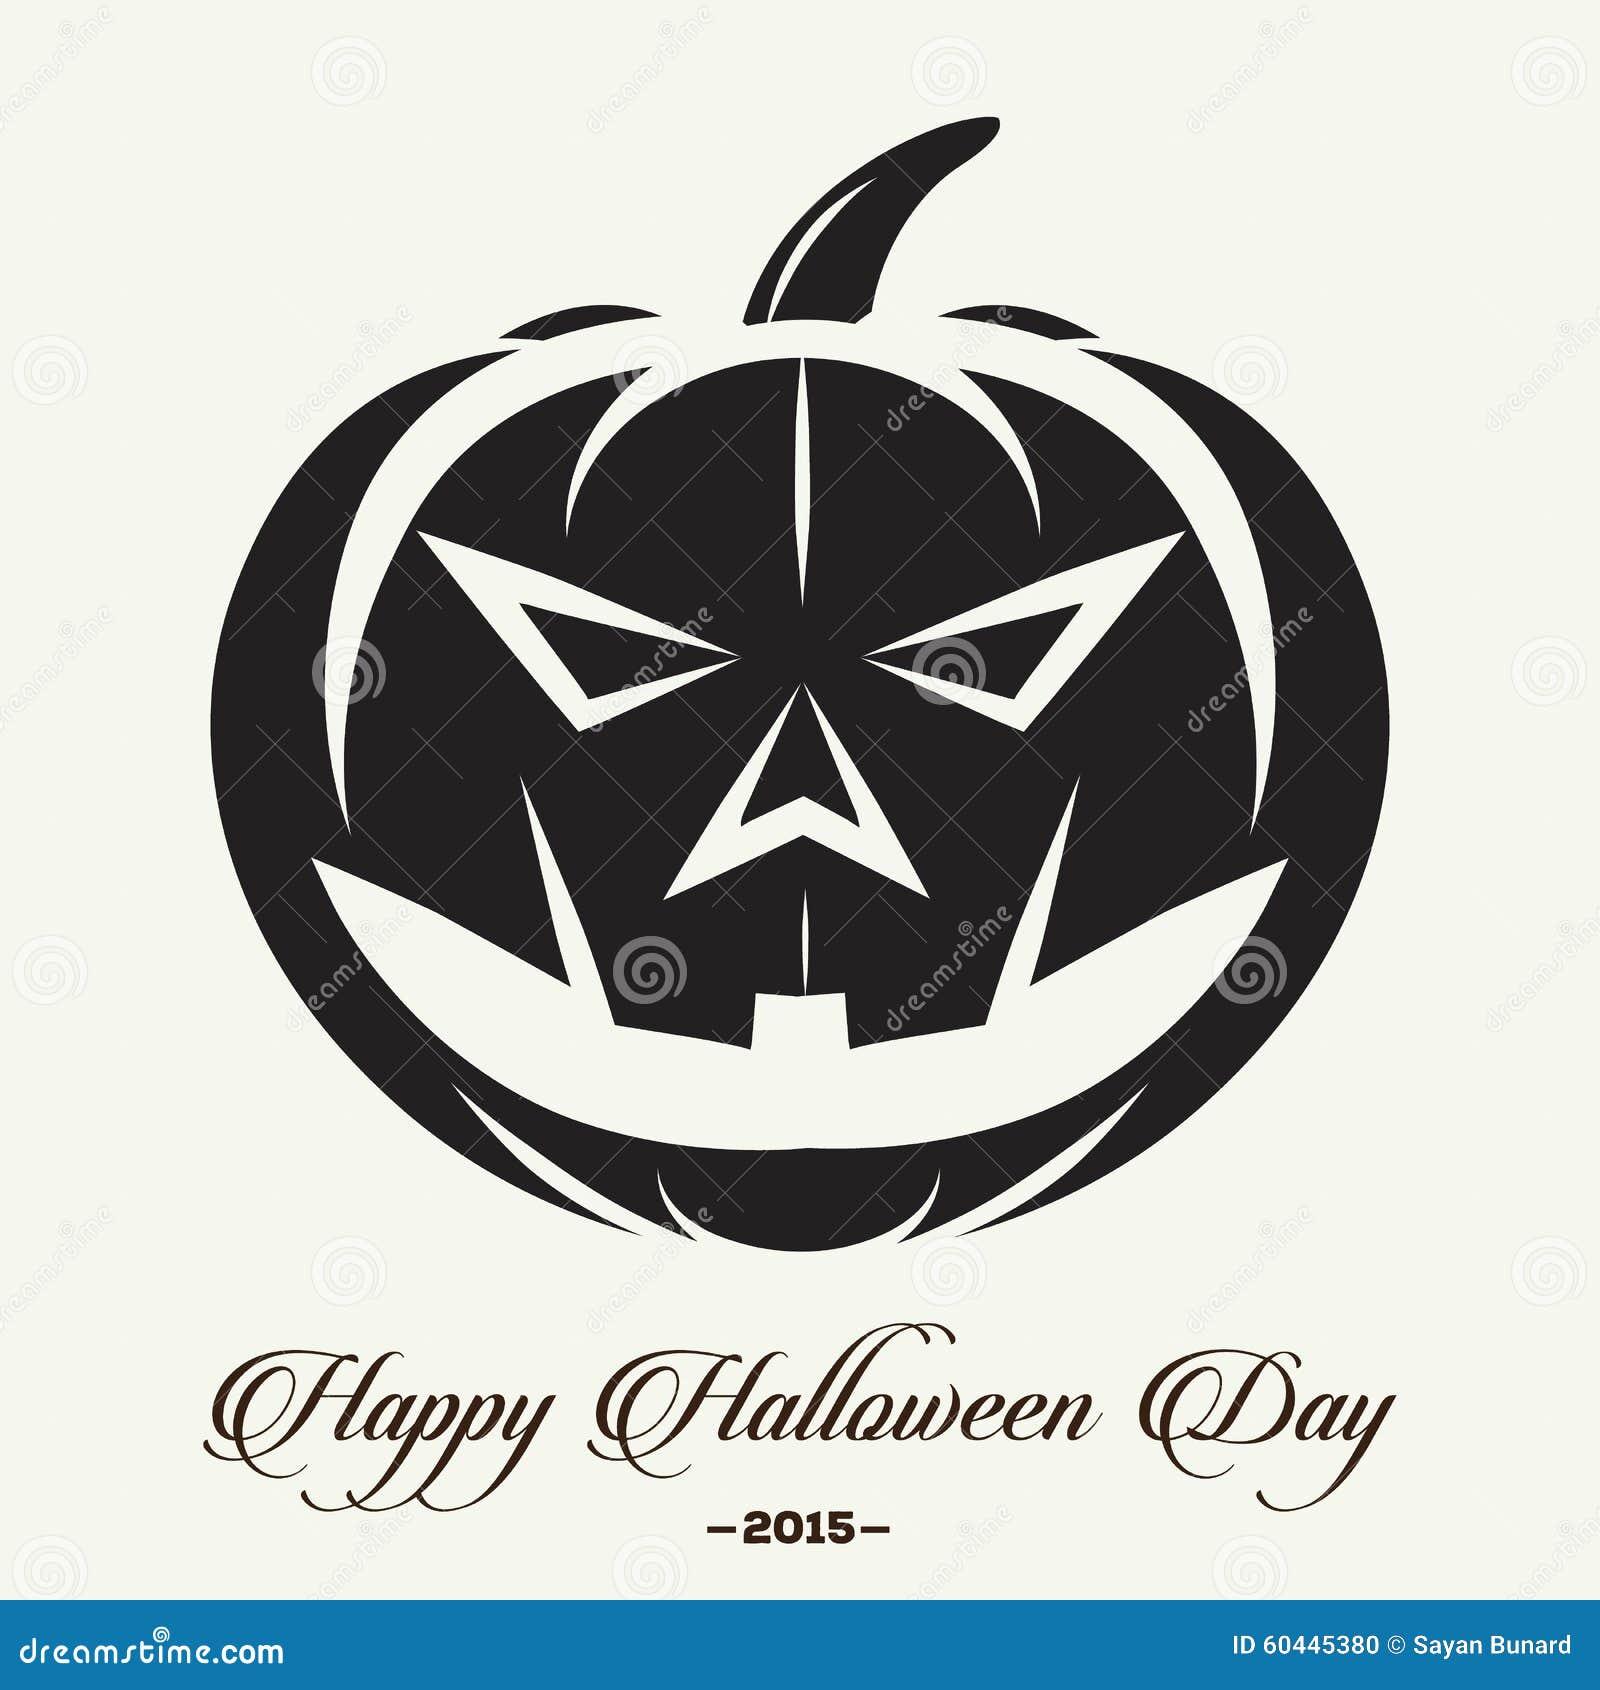 Halloween LOGO stock illustration. Image of evil, witch - 60445380